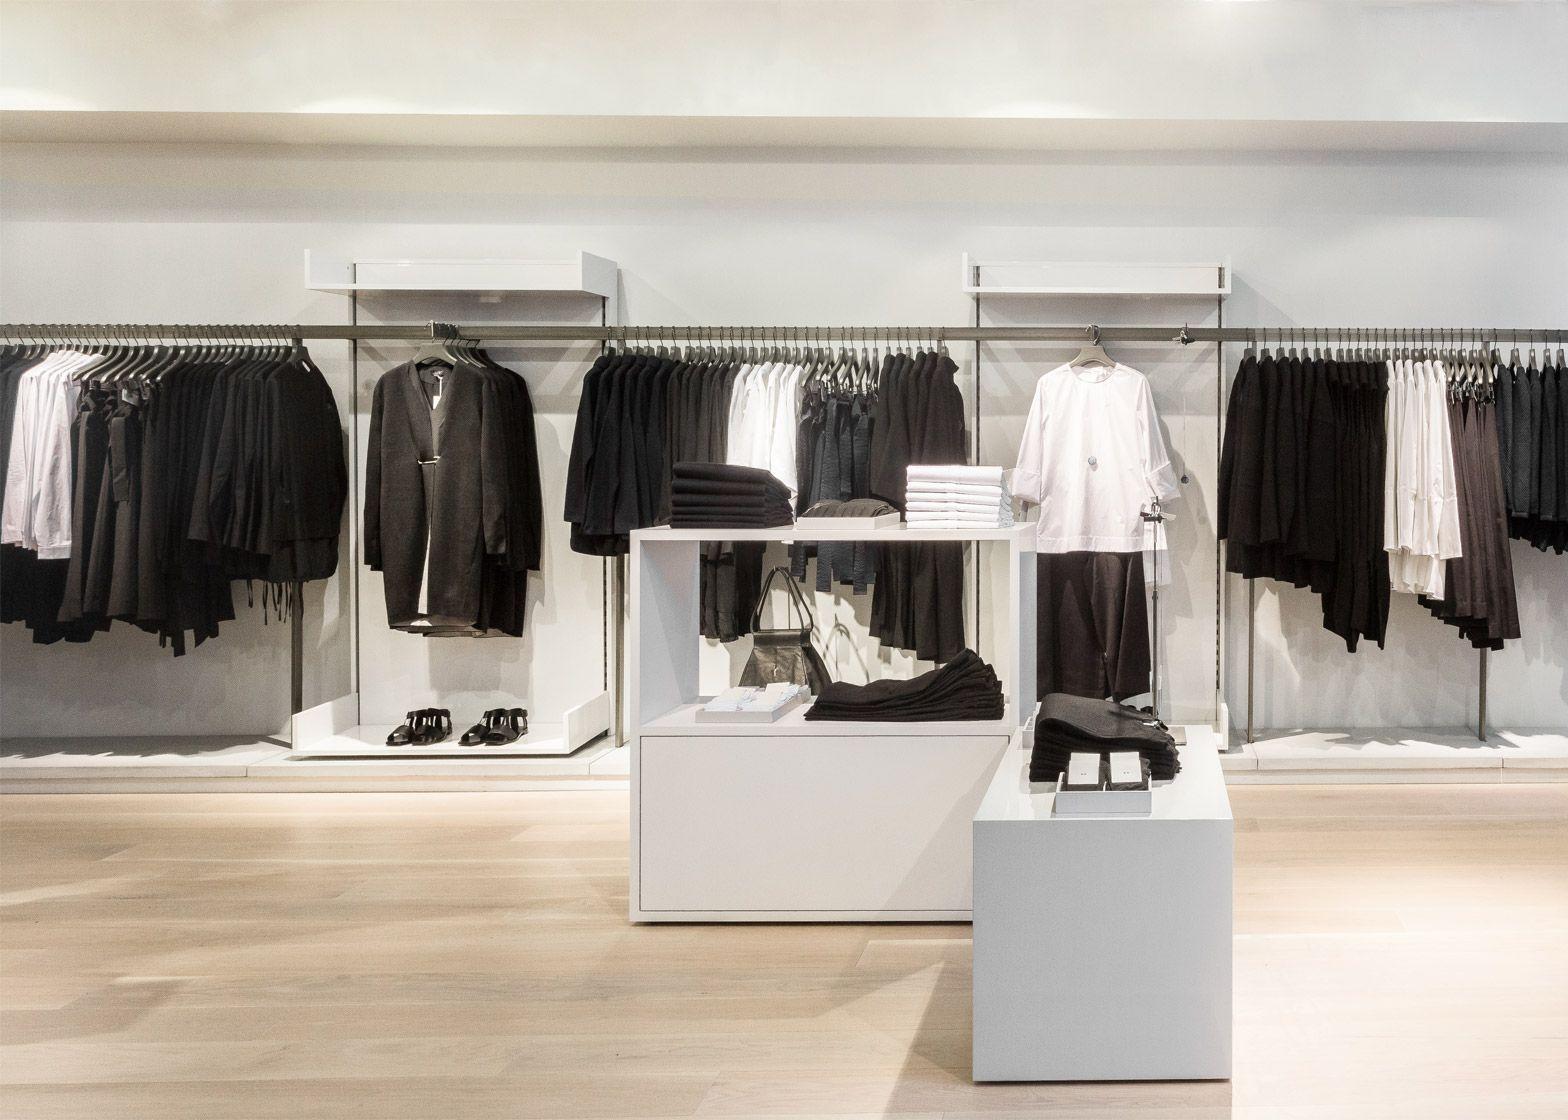 Cos store in toronto 옷 가겜 인템리어 인템리어 옷가겜